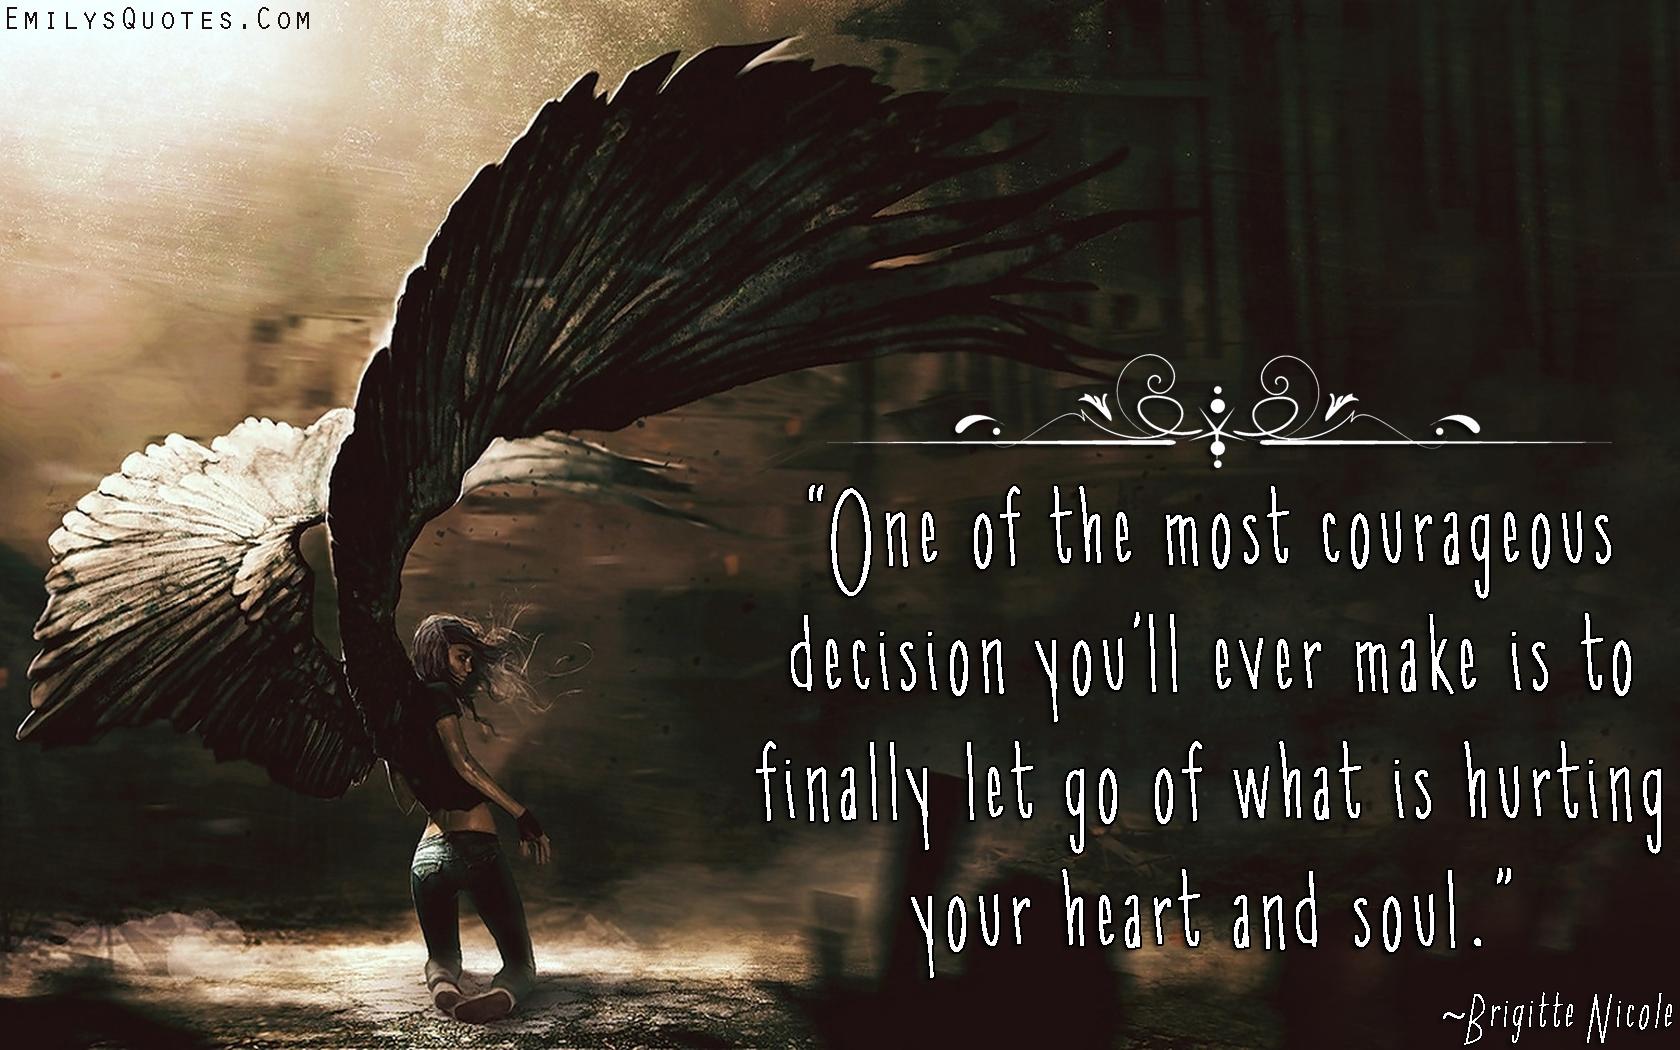 EmilysQuotes.Com - courage, decision, choice, letting go, hurt, pain, heart, soul, inspirational, Brigitte Nicole